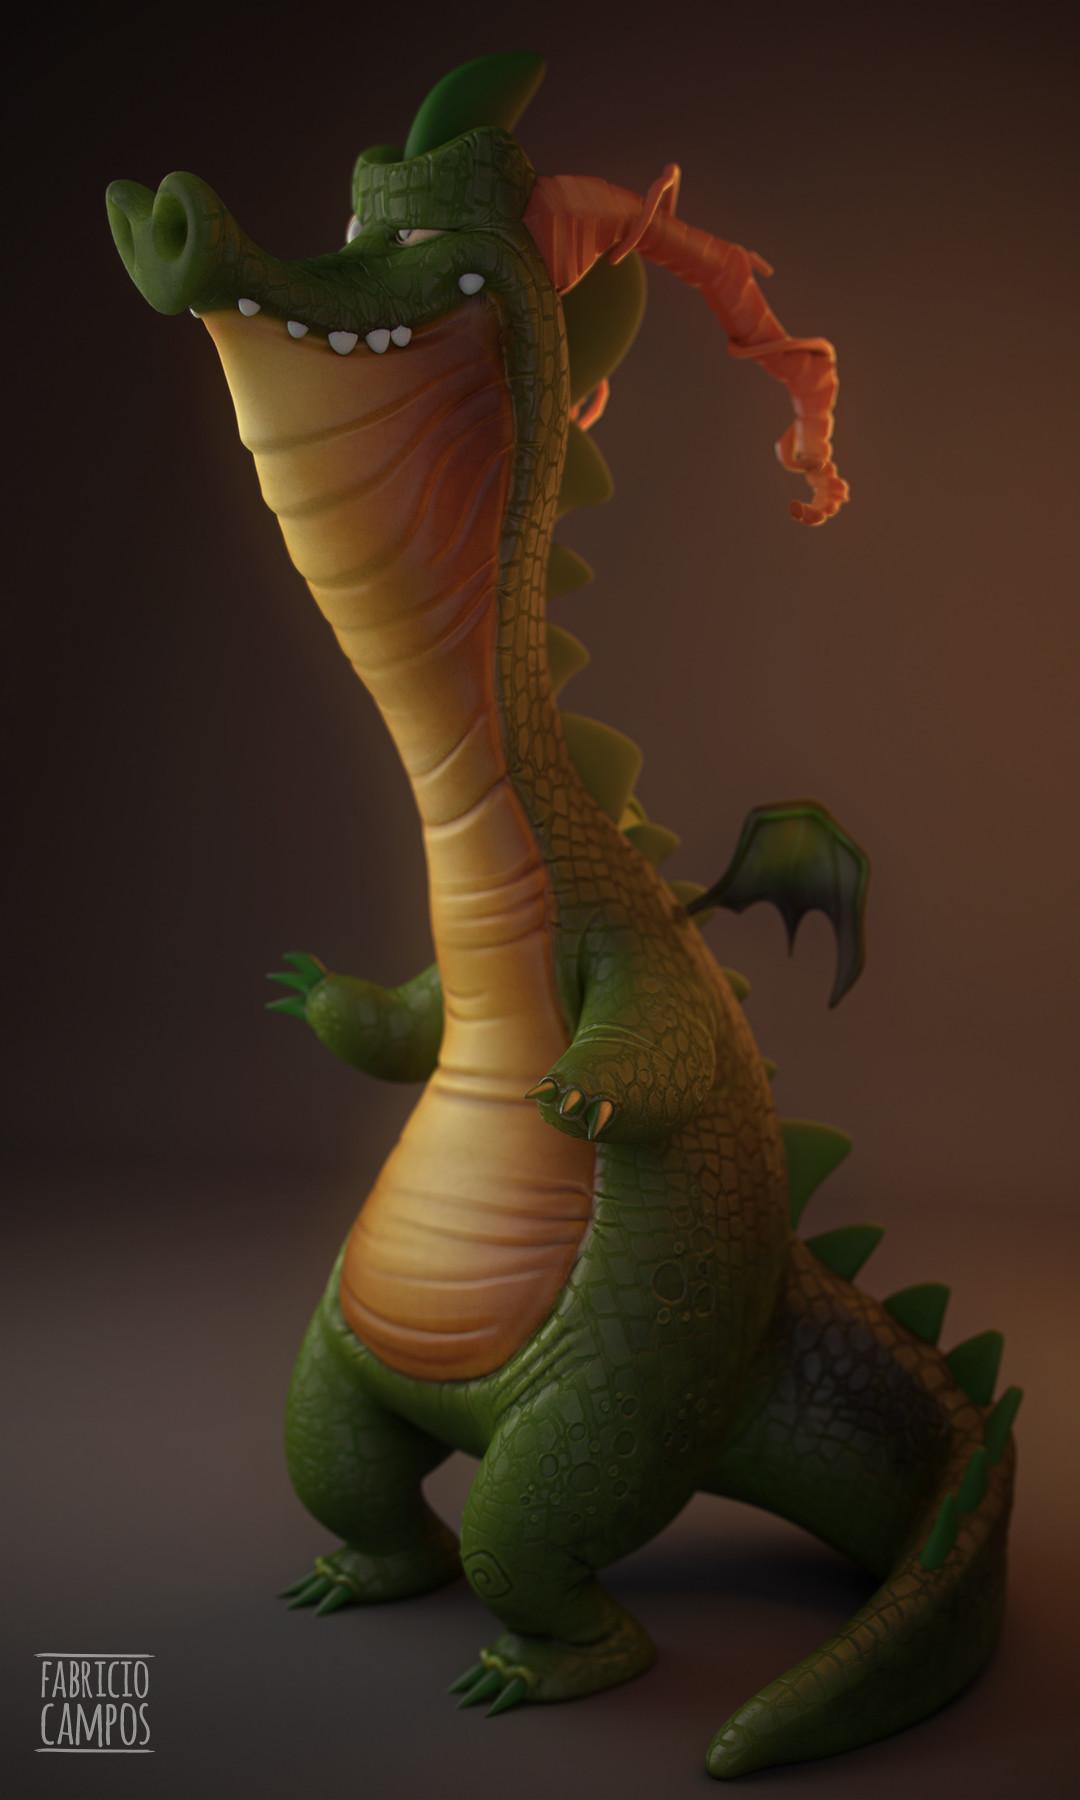 Fabricio campos dragon final